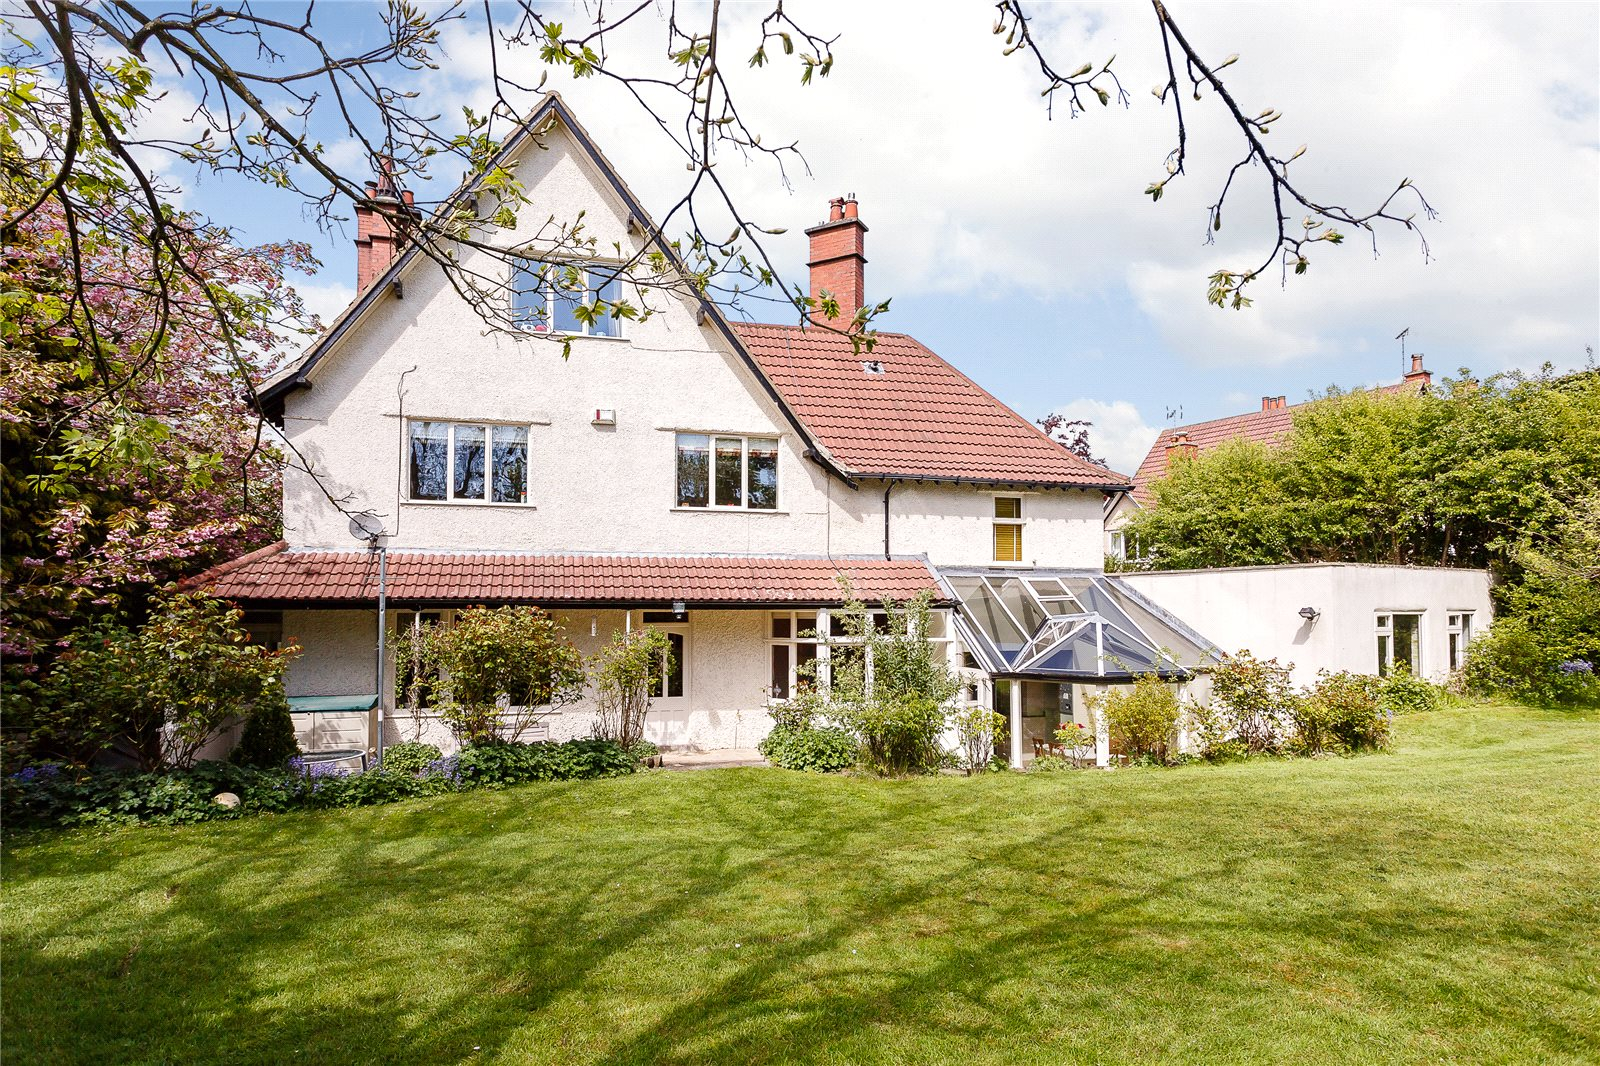 Harrogate Luxury Real Estate for Sale | Christie's ...